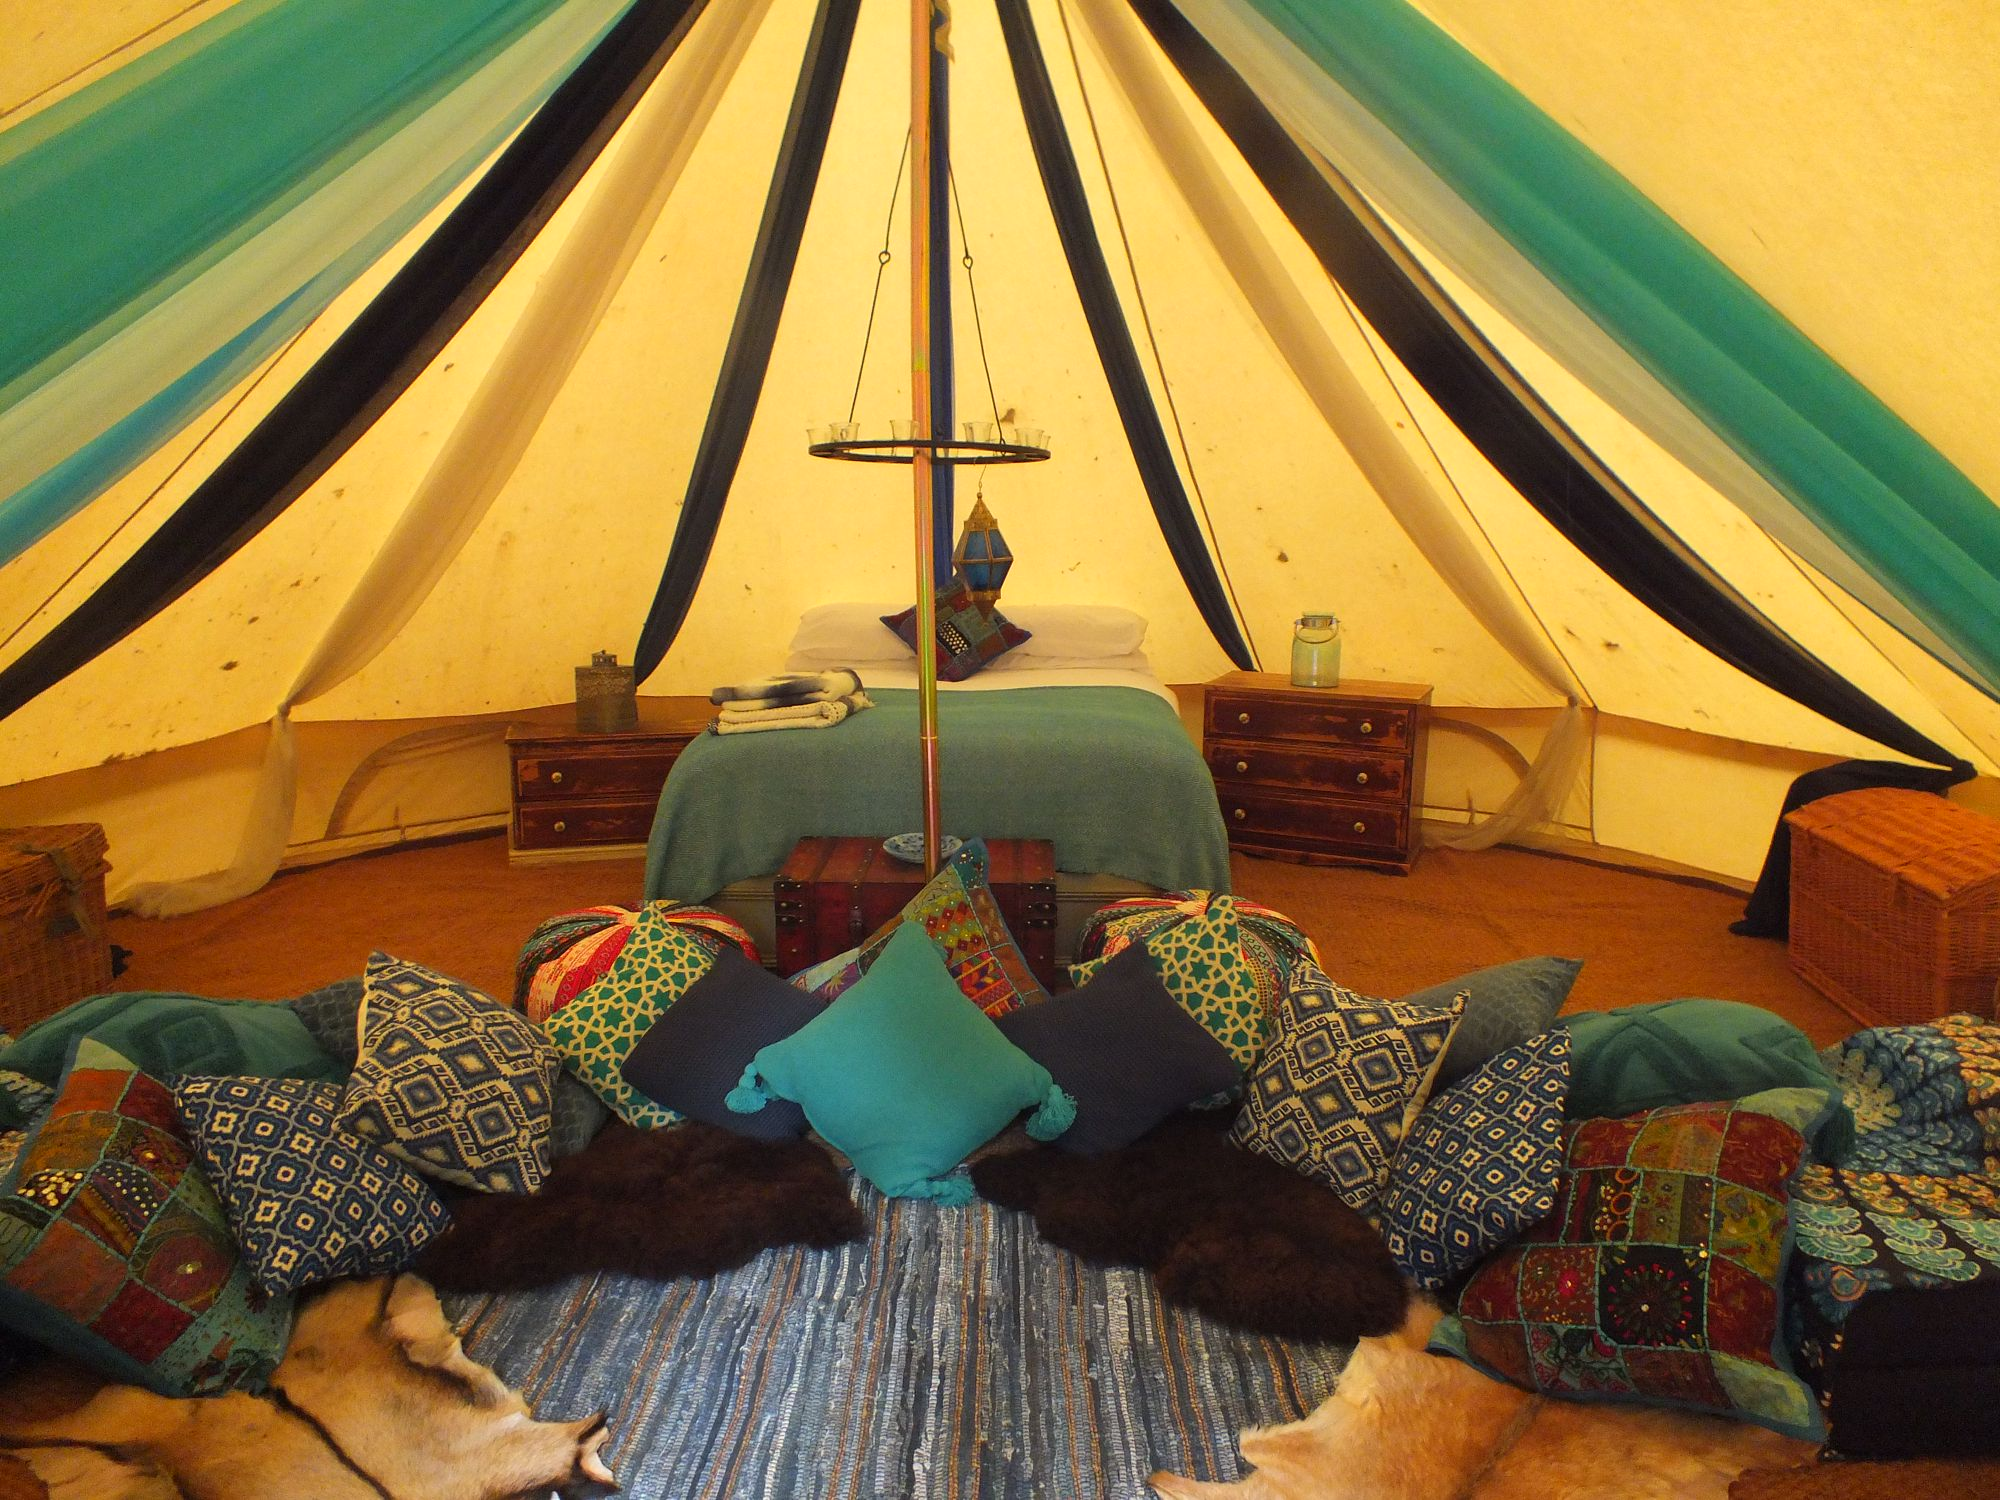 The Moroccan Bell Tent & The Moroccan Bell Tent at Hollington Park Glamping - Cool Camping